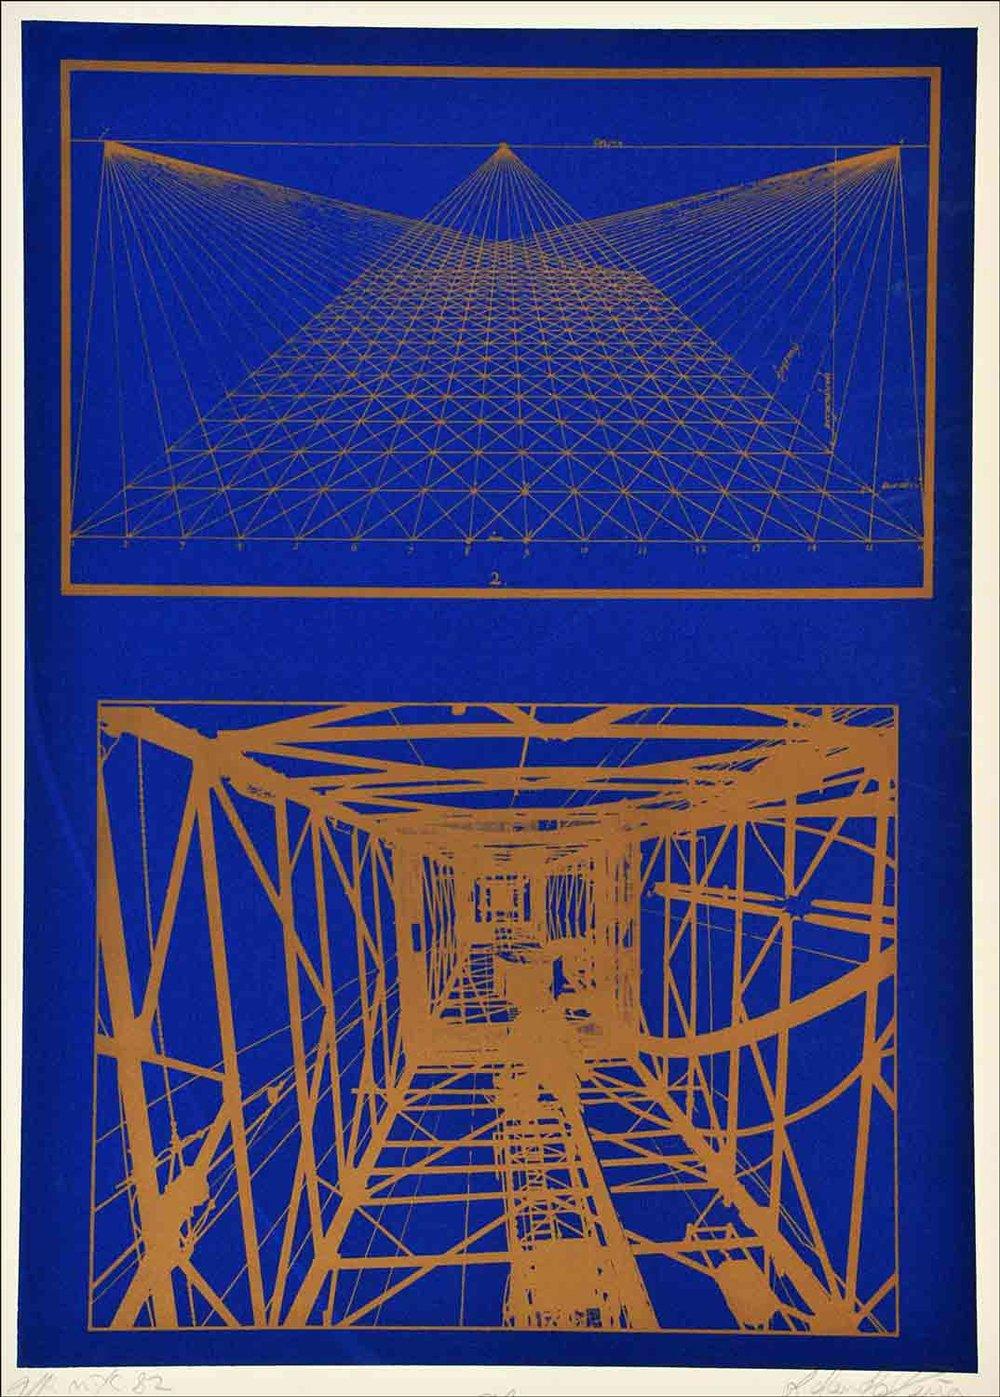 Rolando-Peña_02_Collective_New-Acquisitions_AMA_Mene_1991.jpg